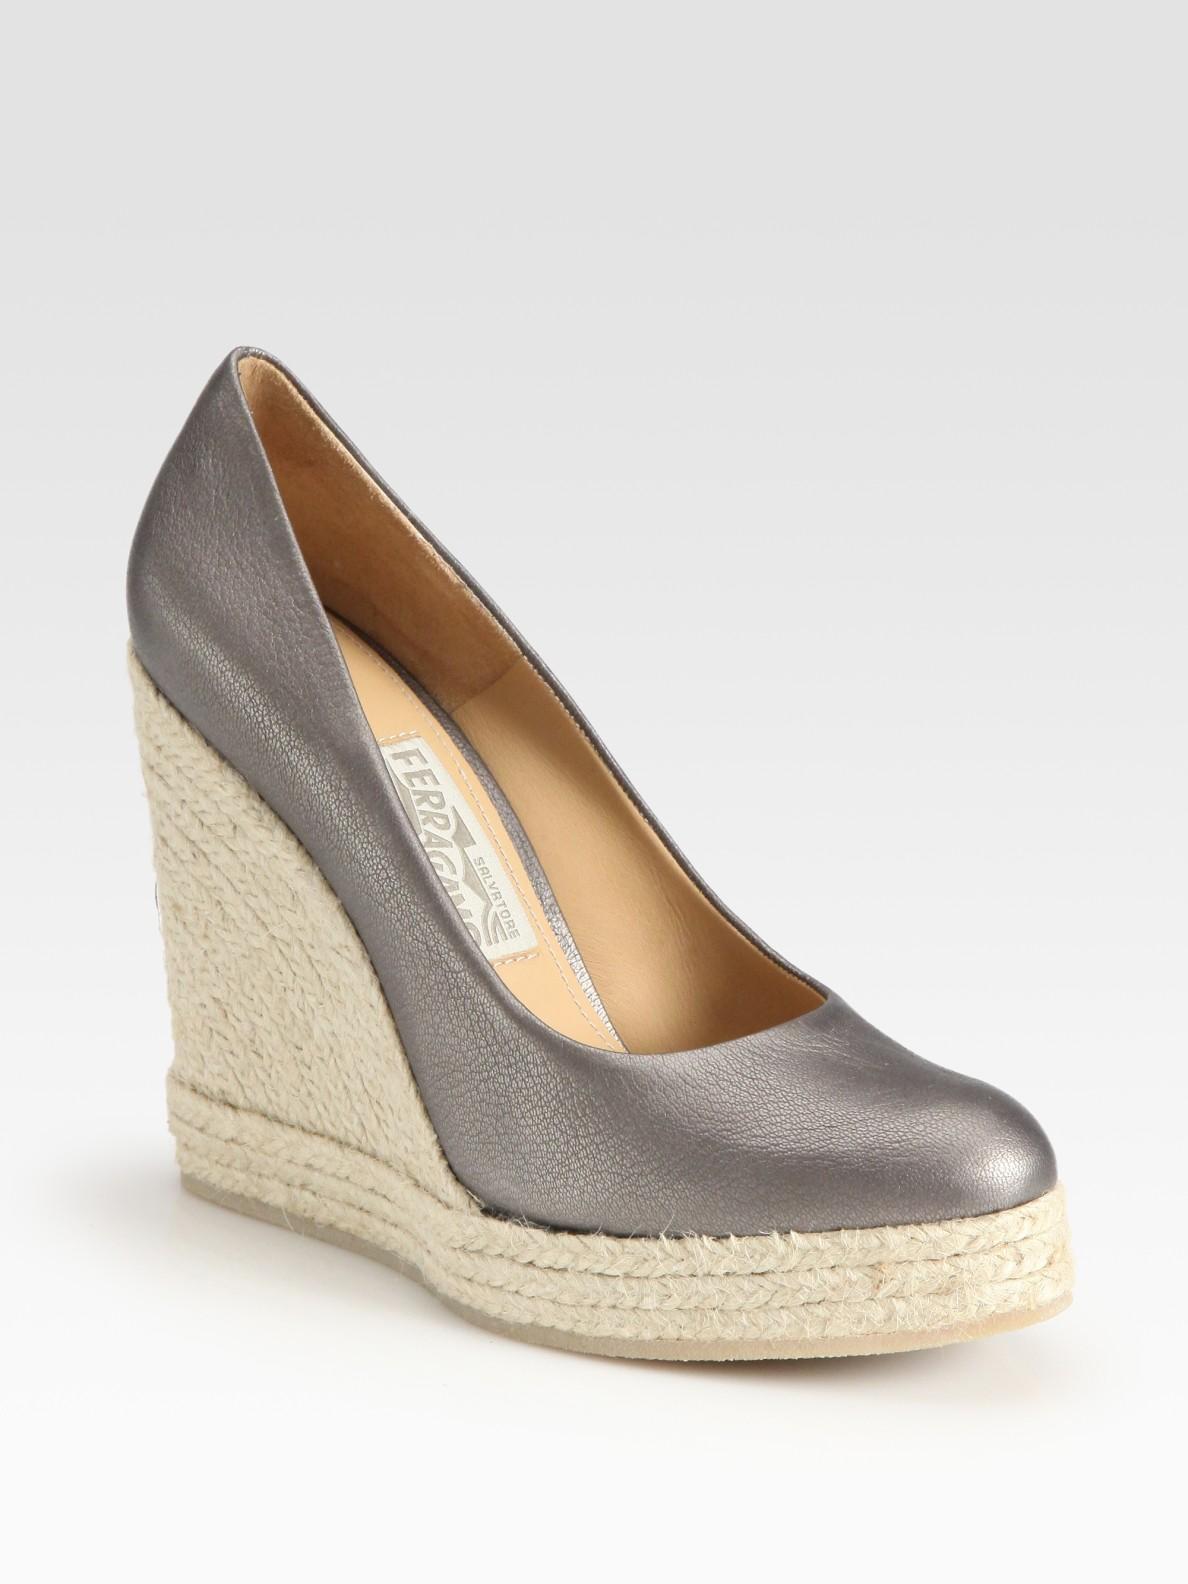 Cynthia Rowley Shoes Flats